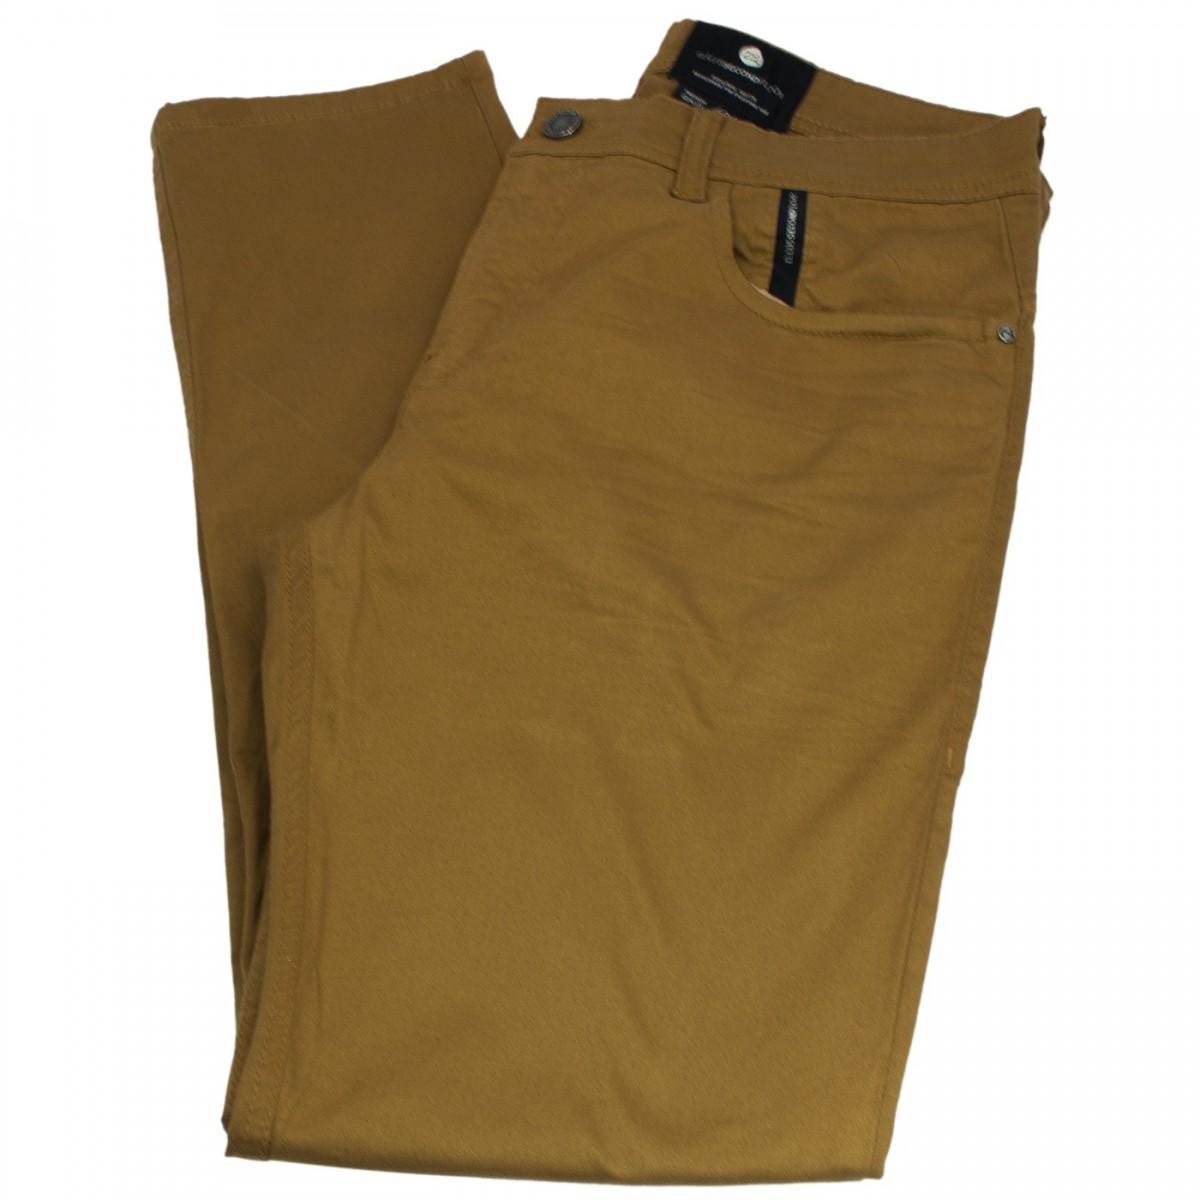 Calça Jeans Ellus Second Floor Sarja Light Color Super Slim 20sa683 Camel